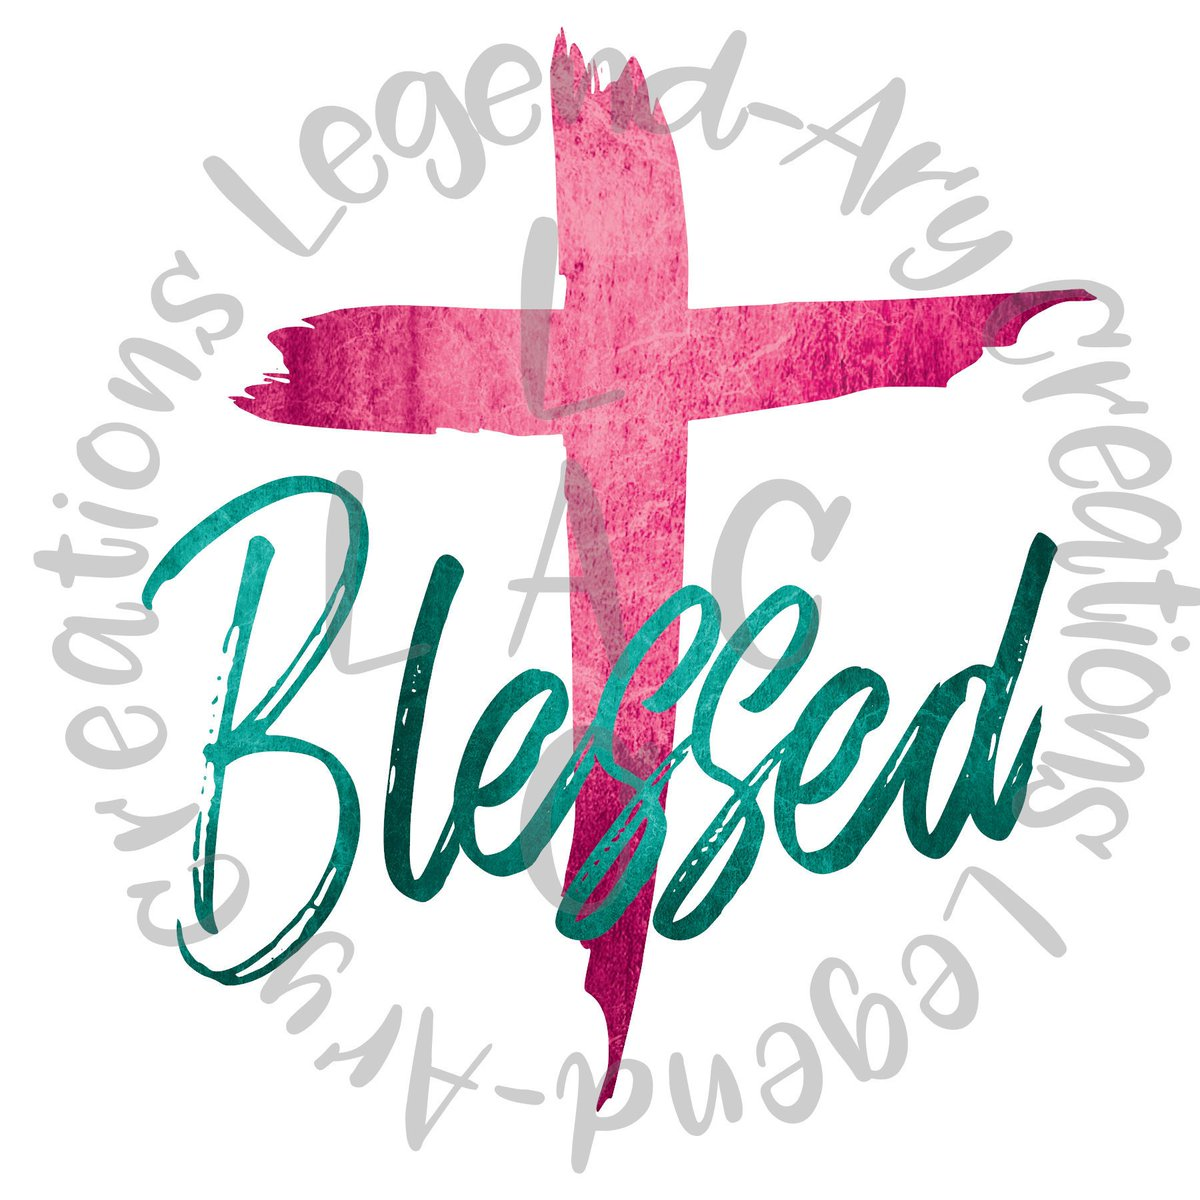 blessedsvg hashtag on Twitter.